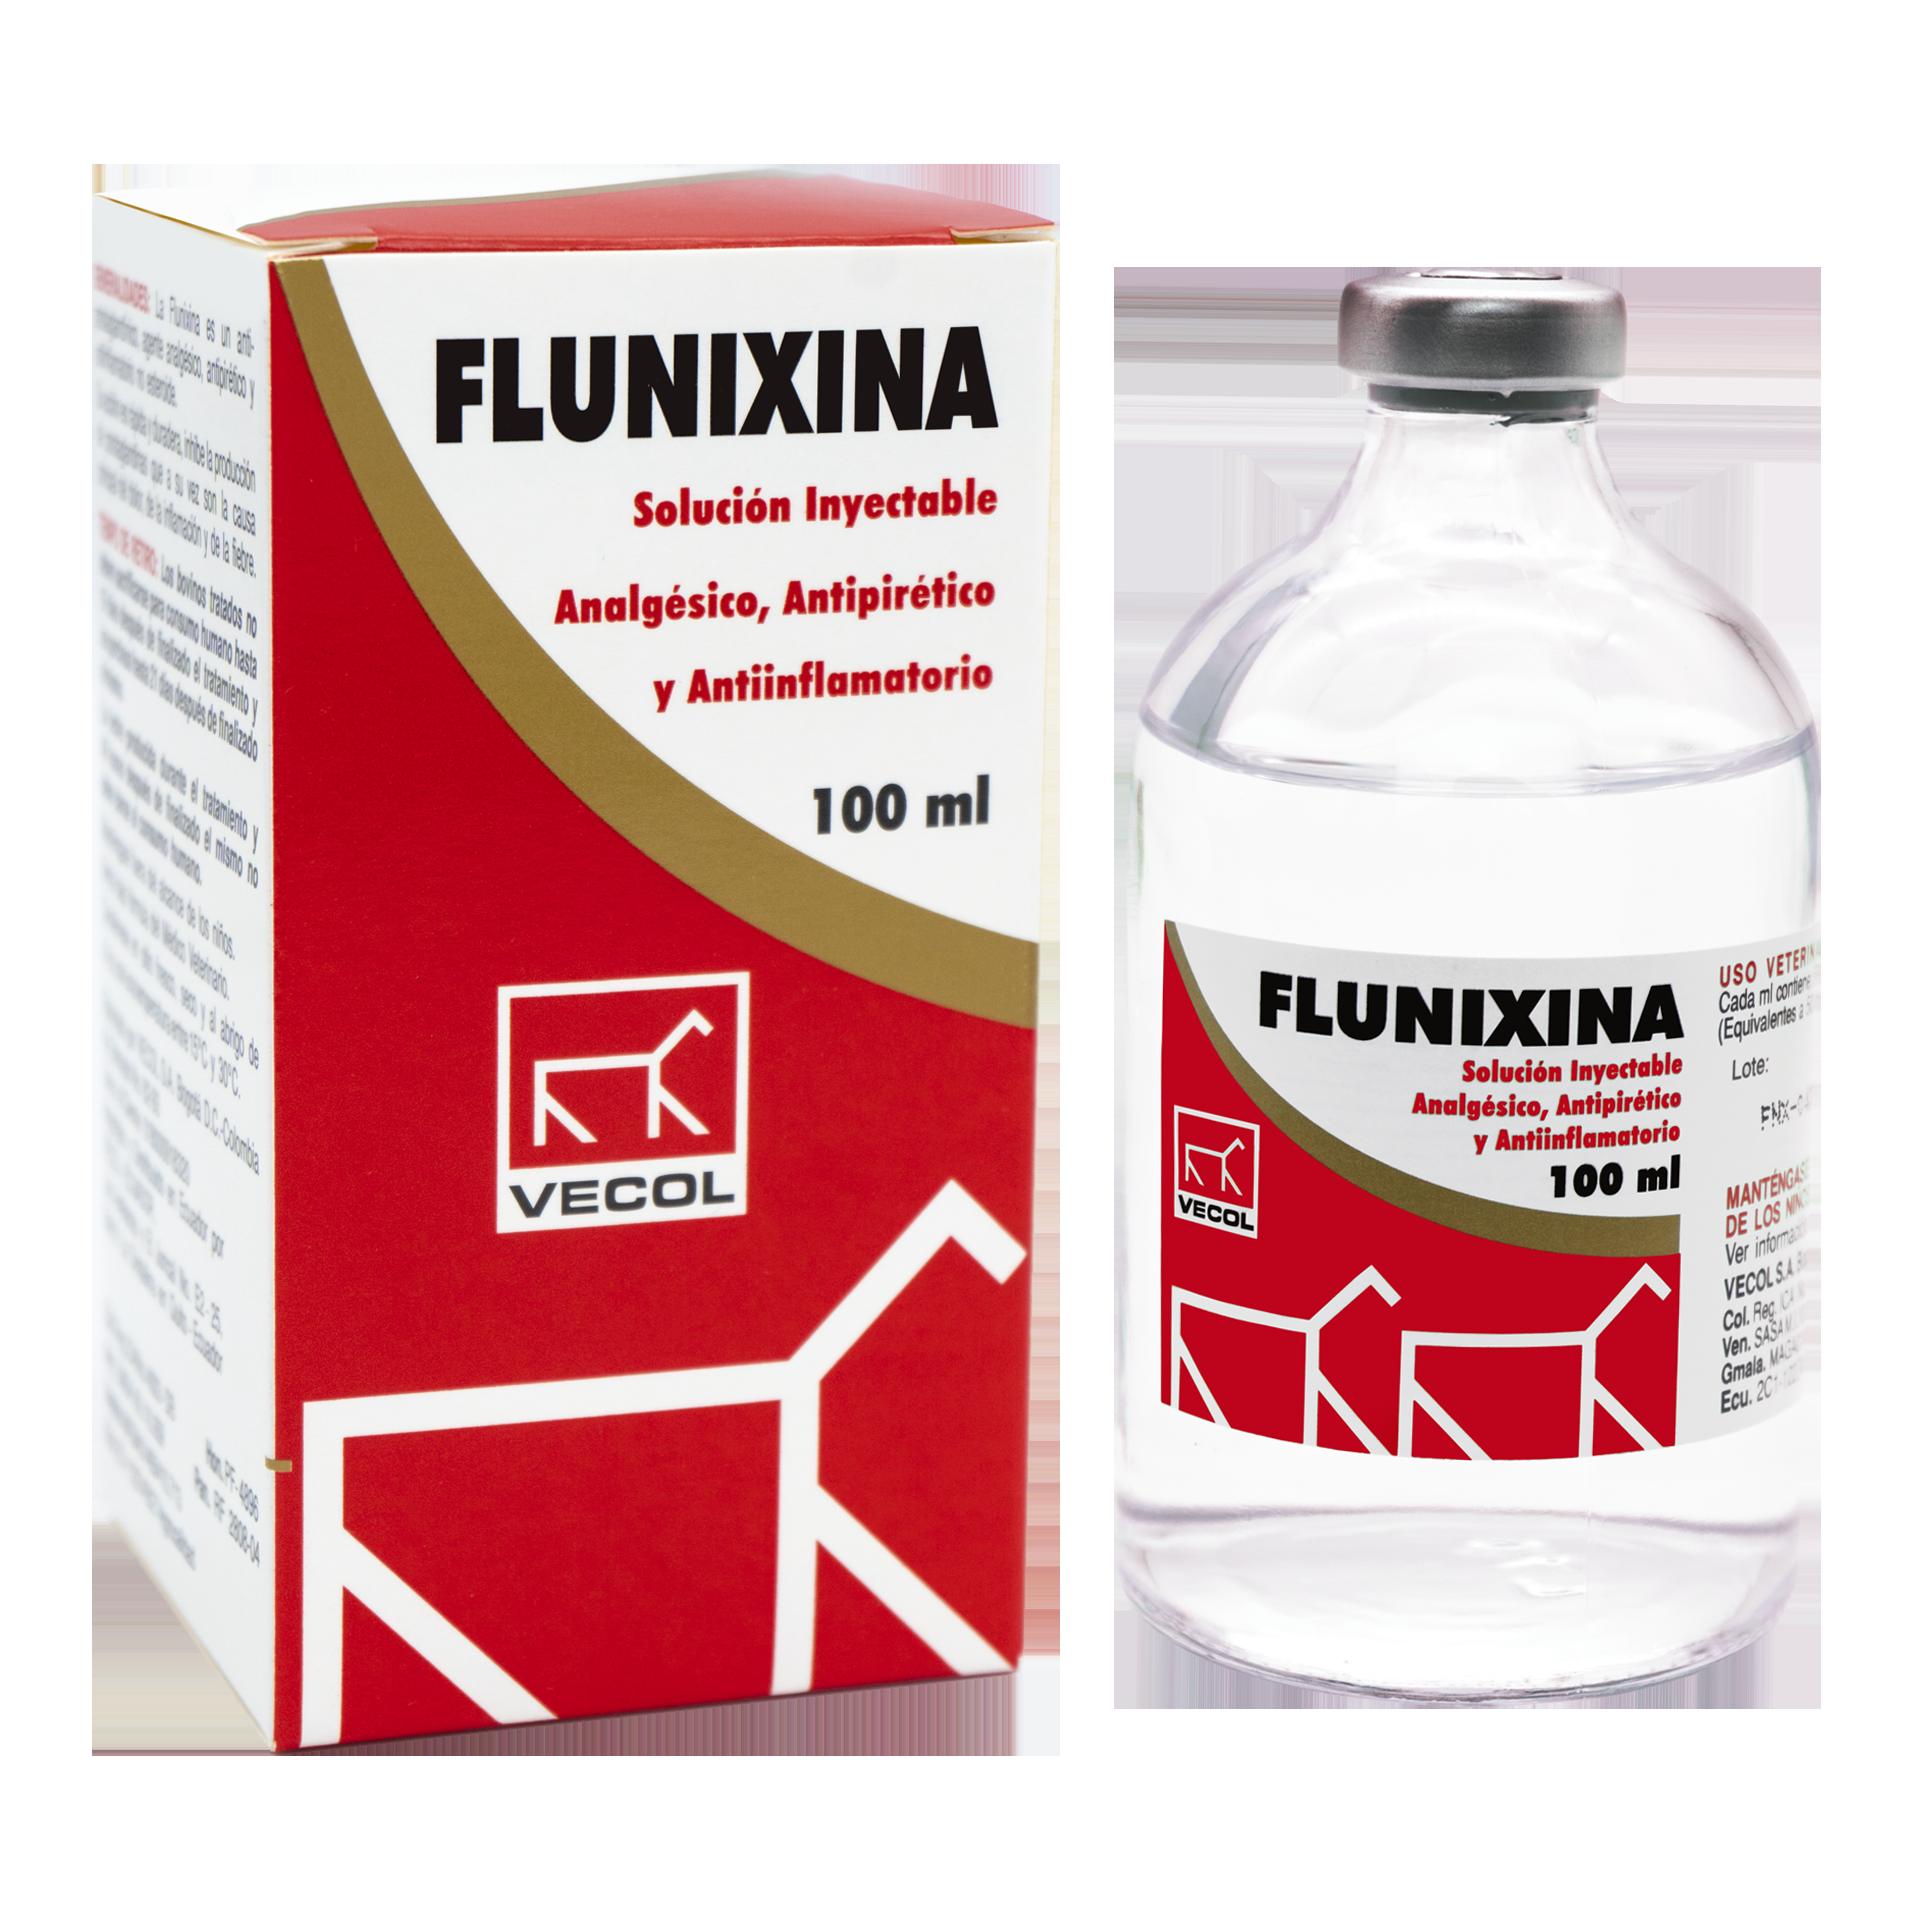 FLUNIXINA